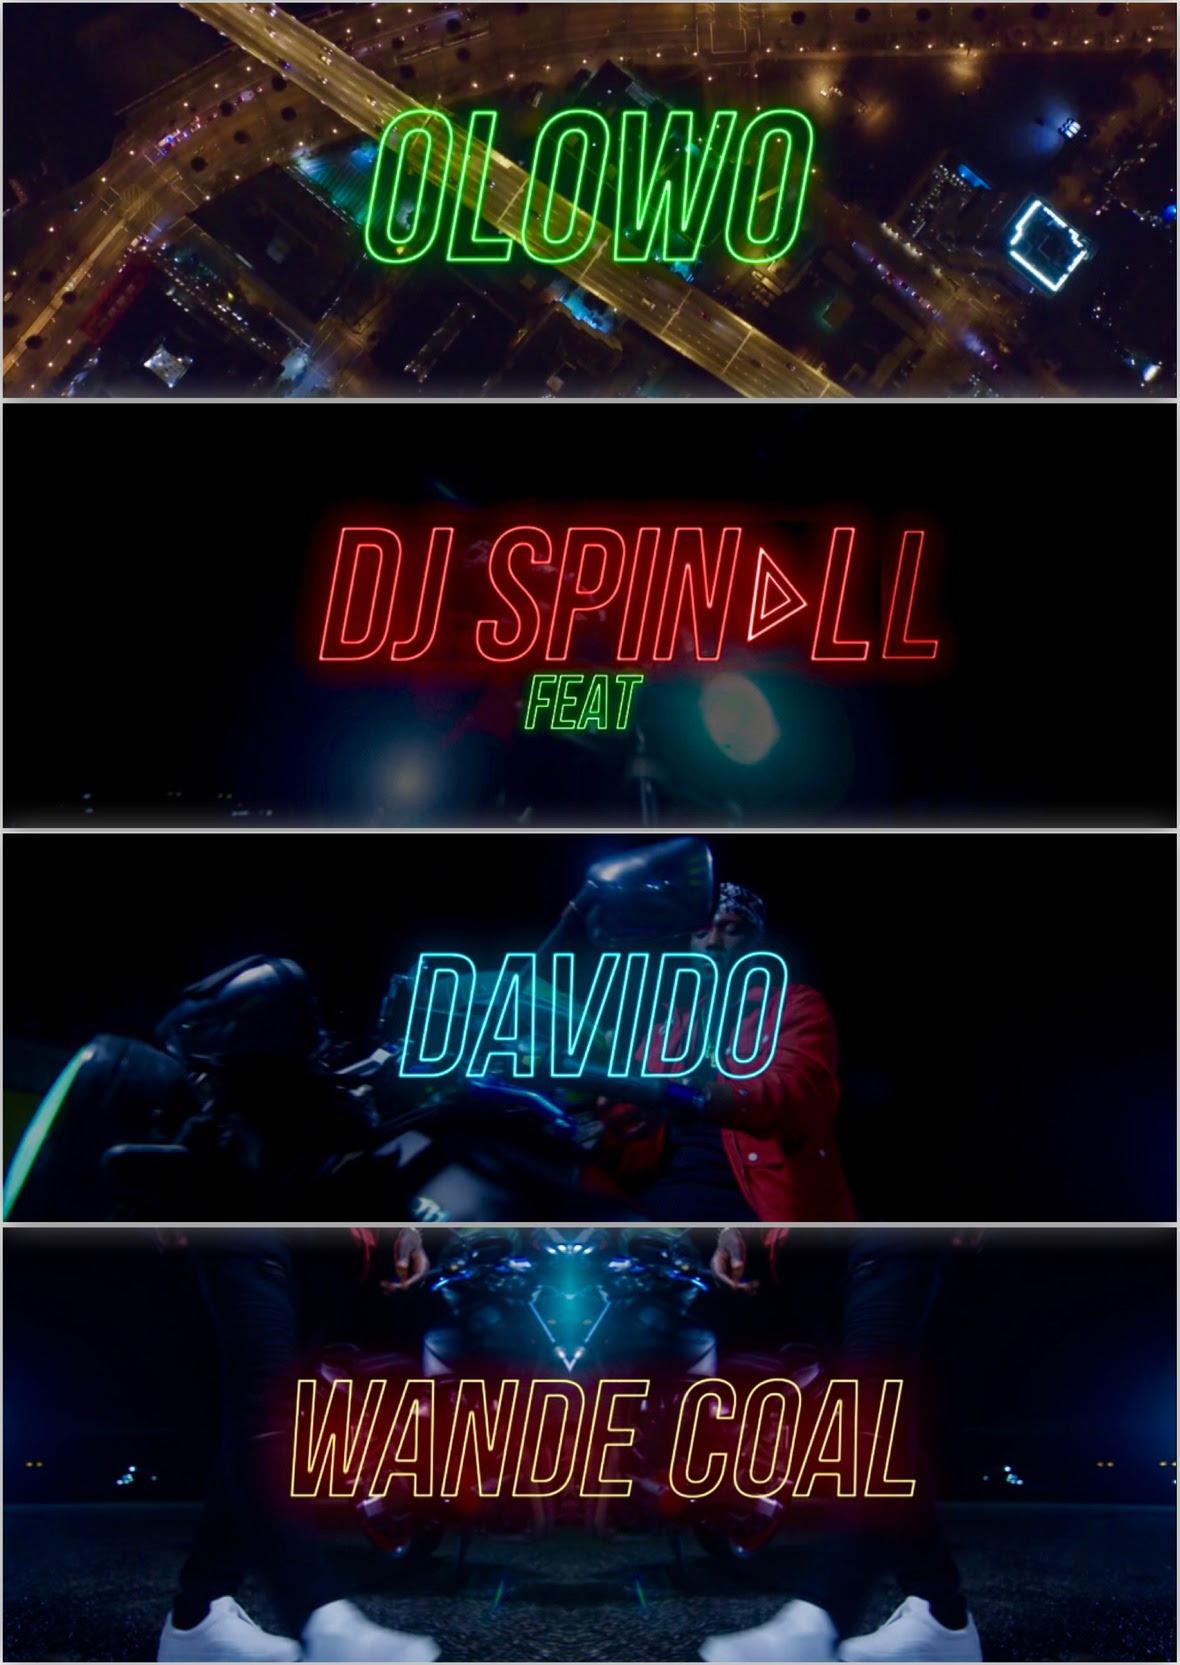 DJ SPINALL - OLOWO